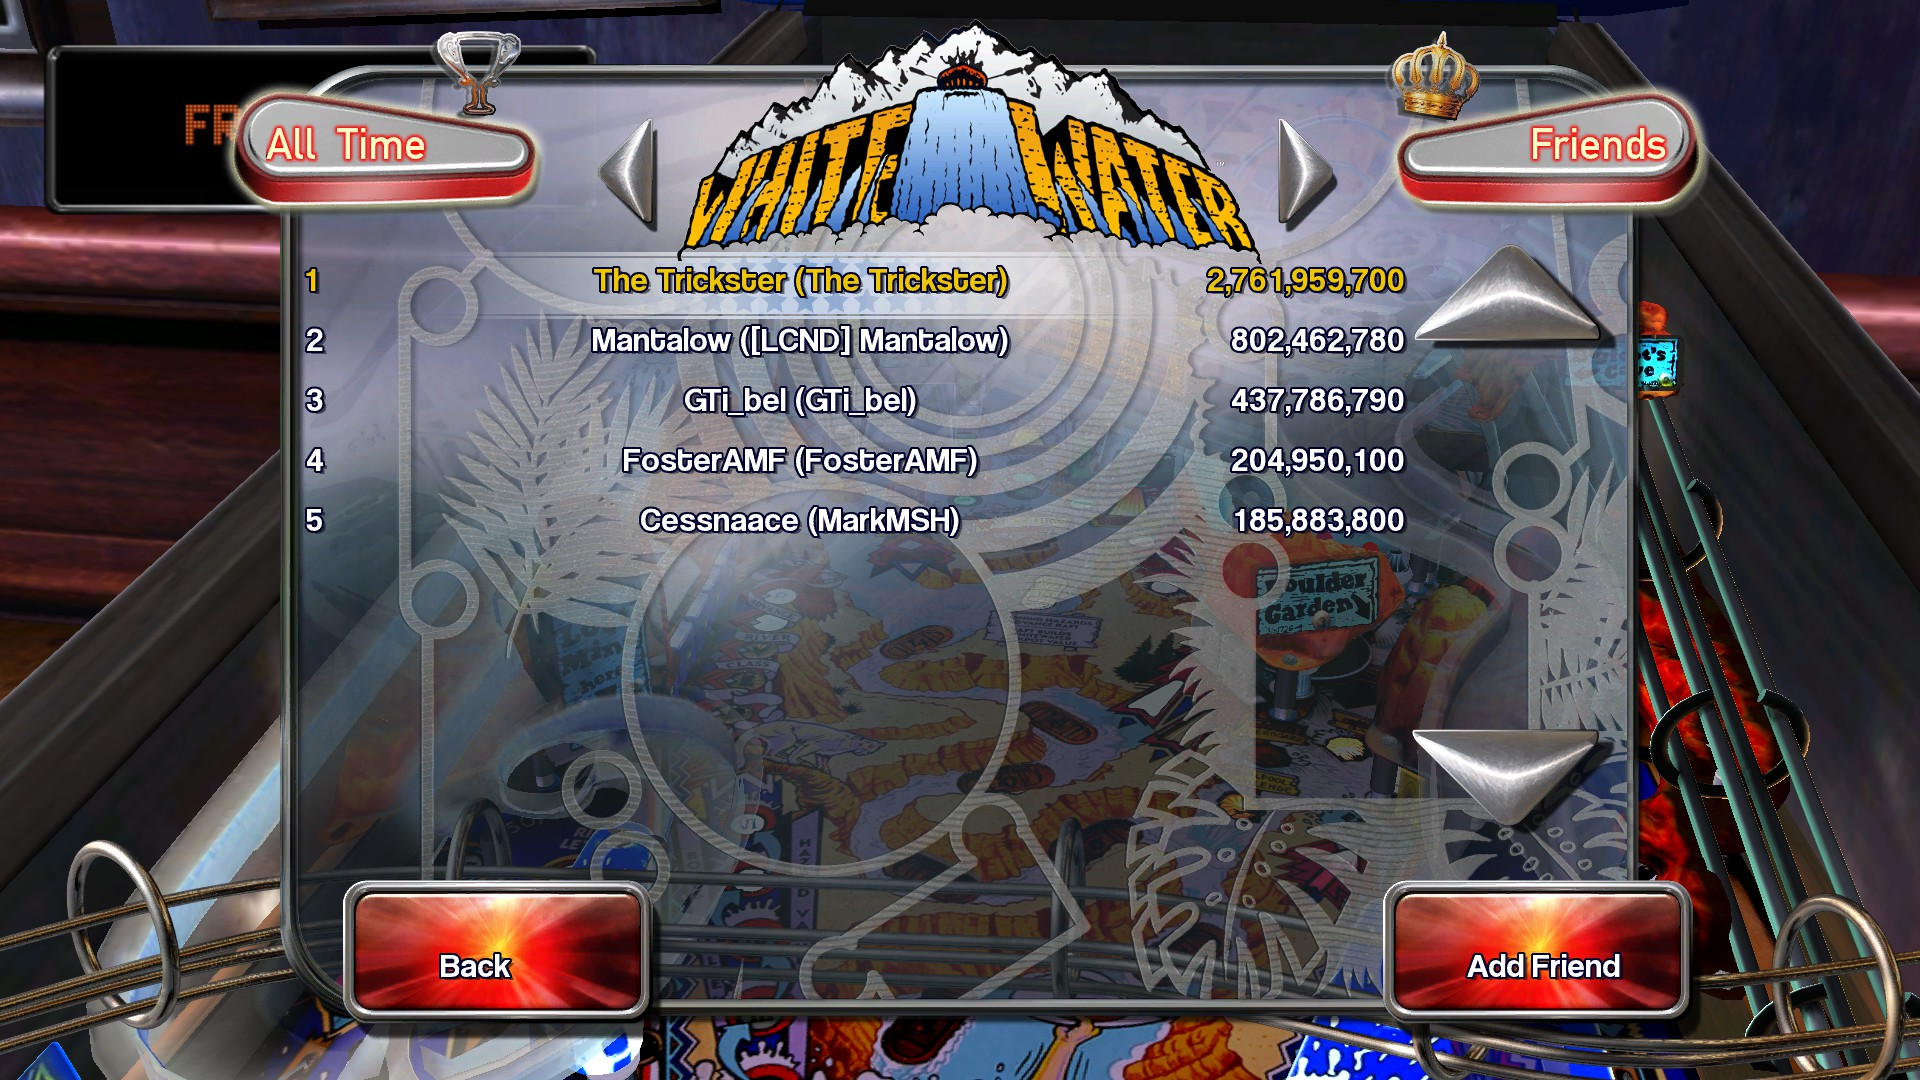 Pinball Arcade: White Water 2,761,959,700 points